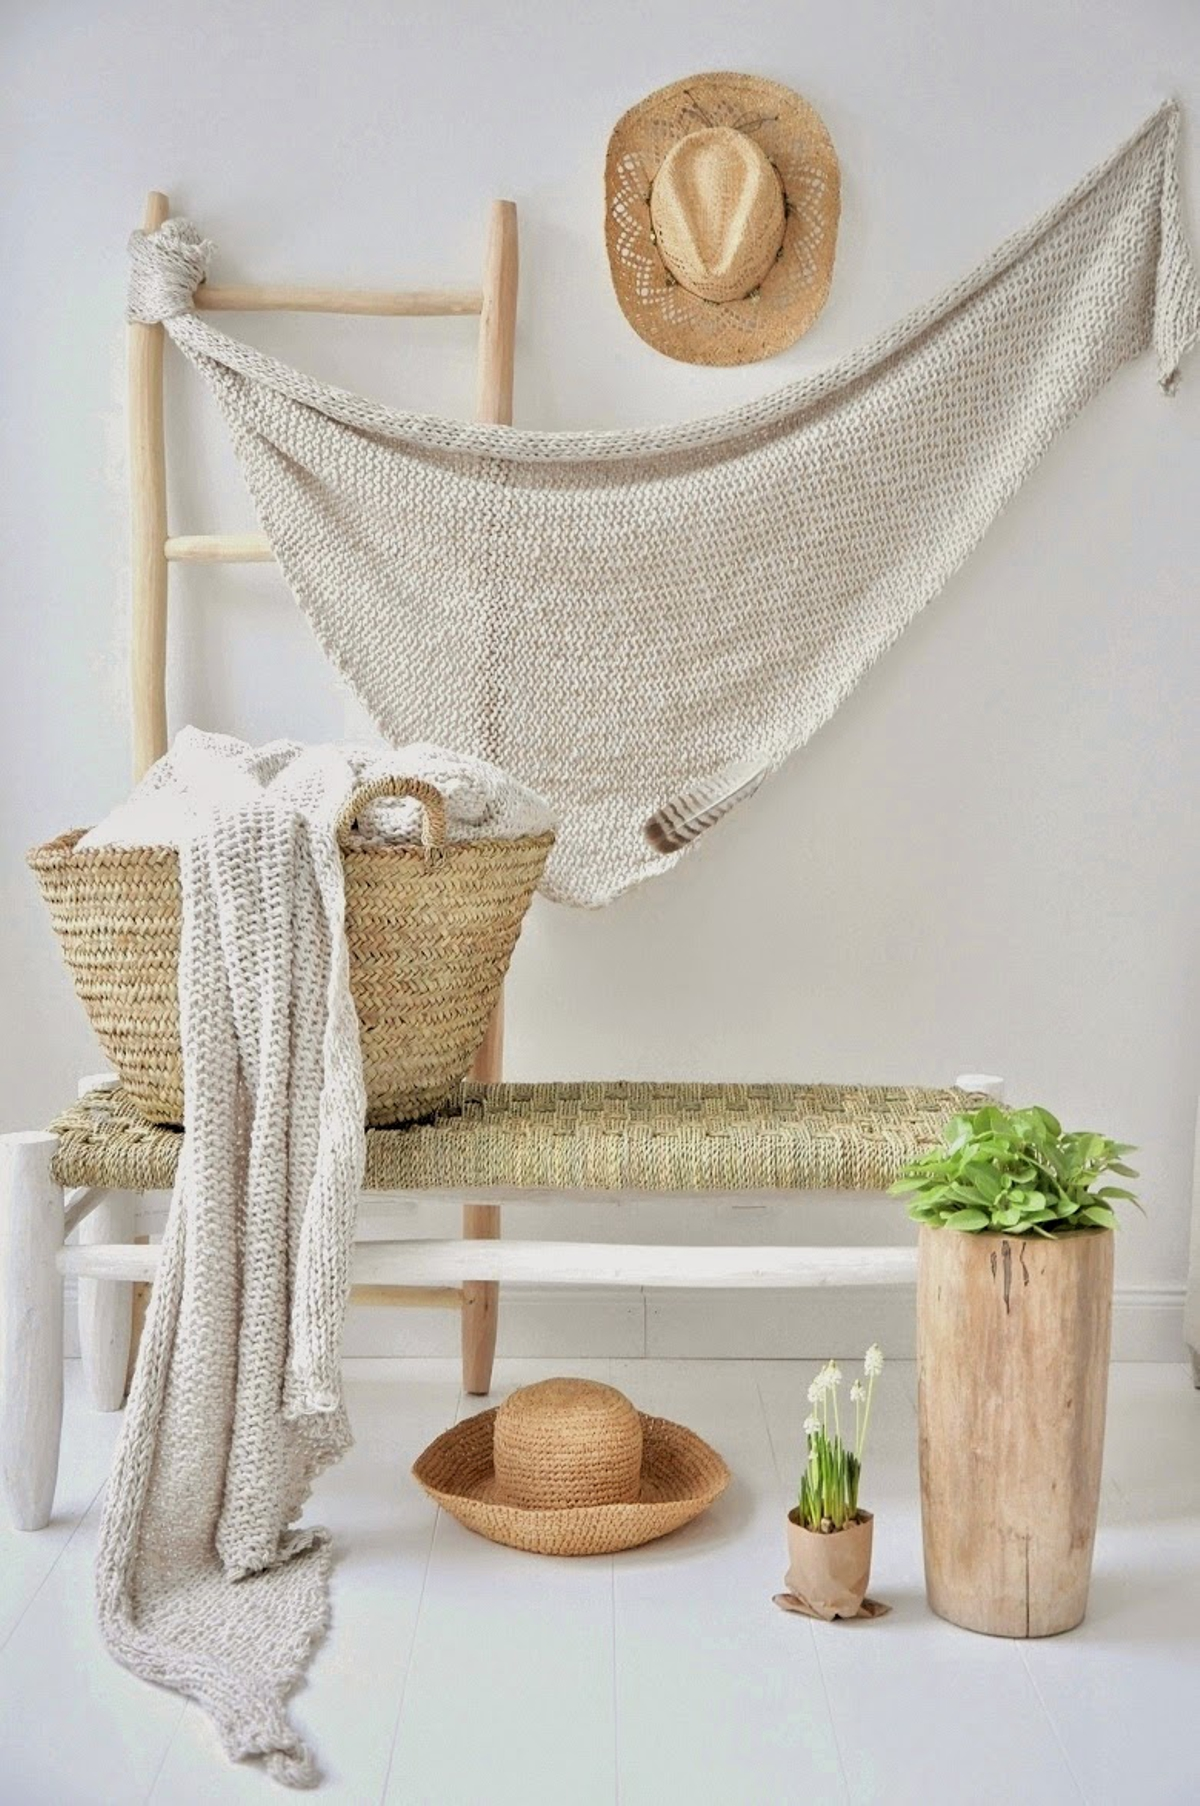 decoración para este verano 2016 - Decoración con fibras naturales